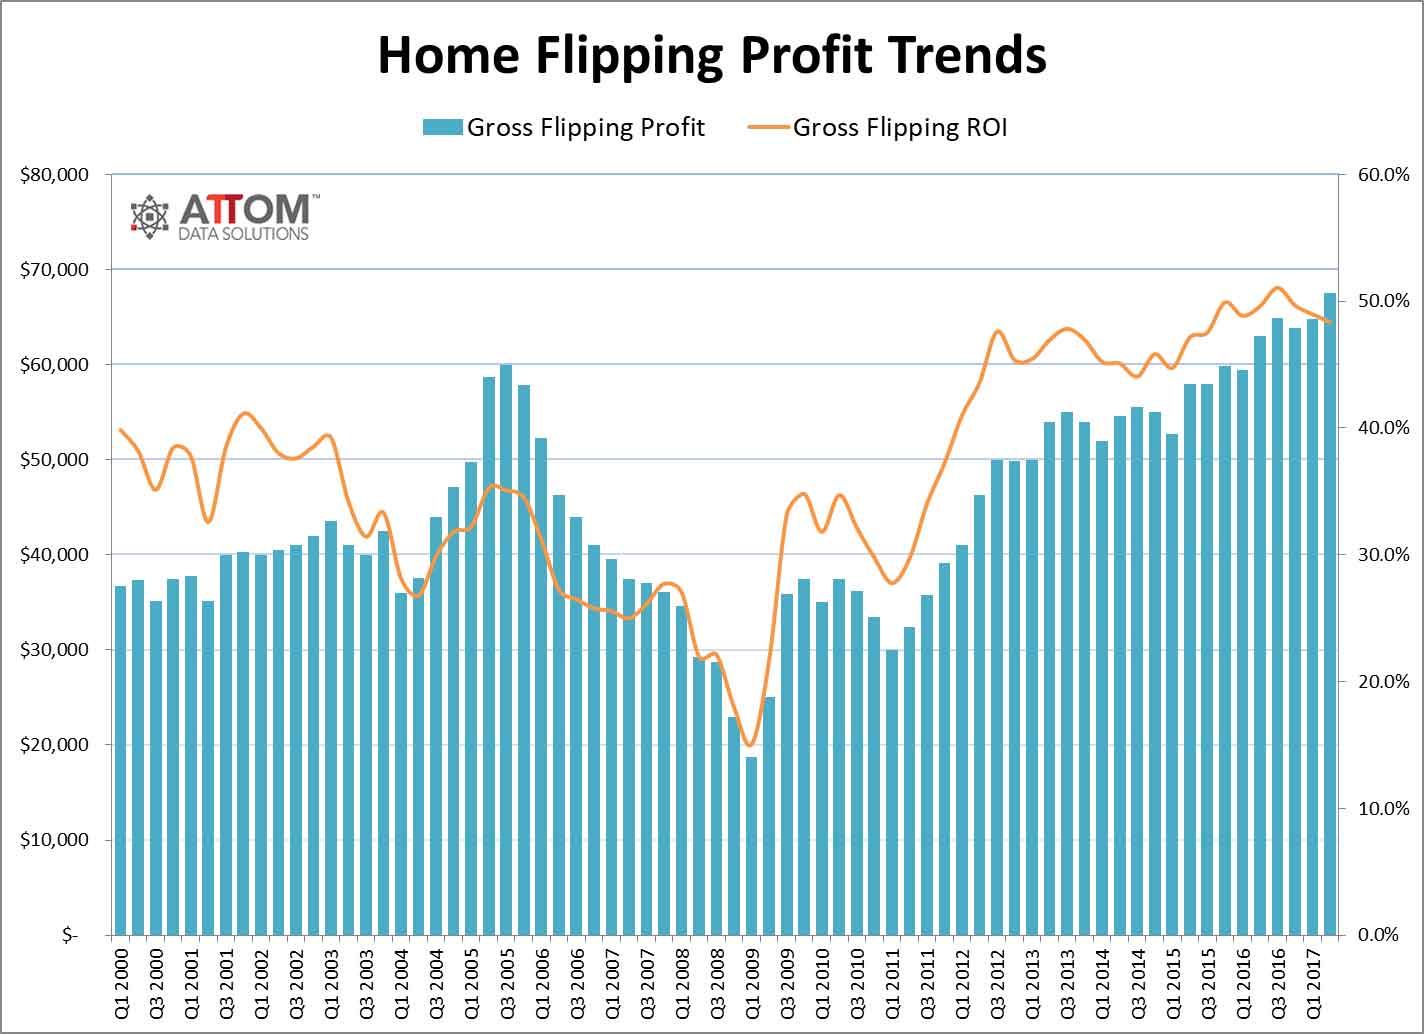 home_flipping_profits_Q2_2017.jpg